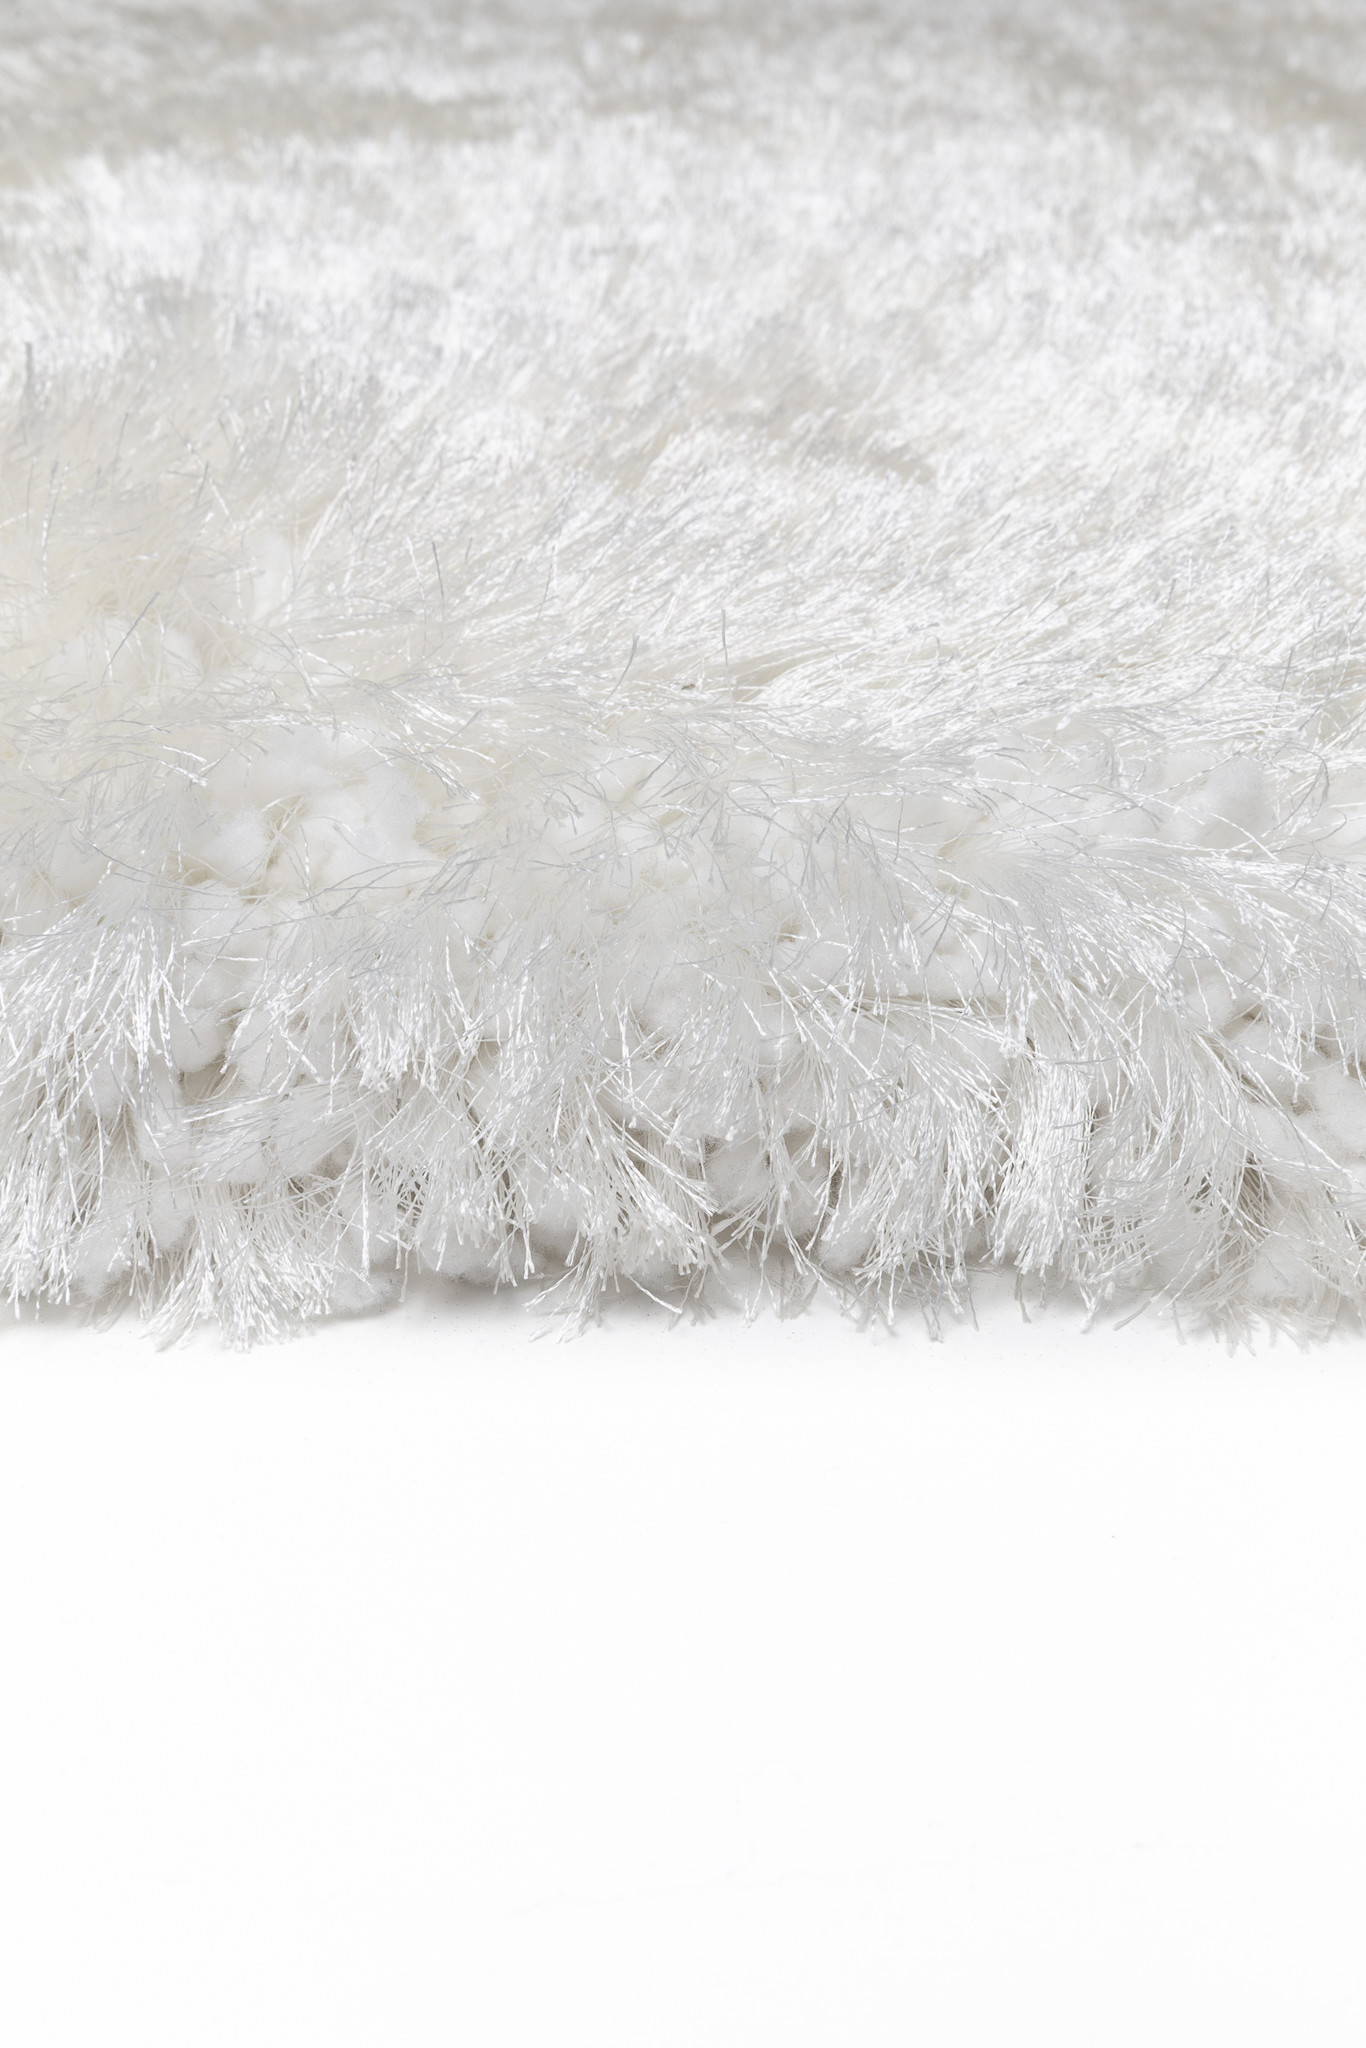 Vloerkleed Adore 100 170x240cm-4